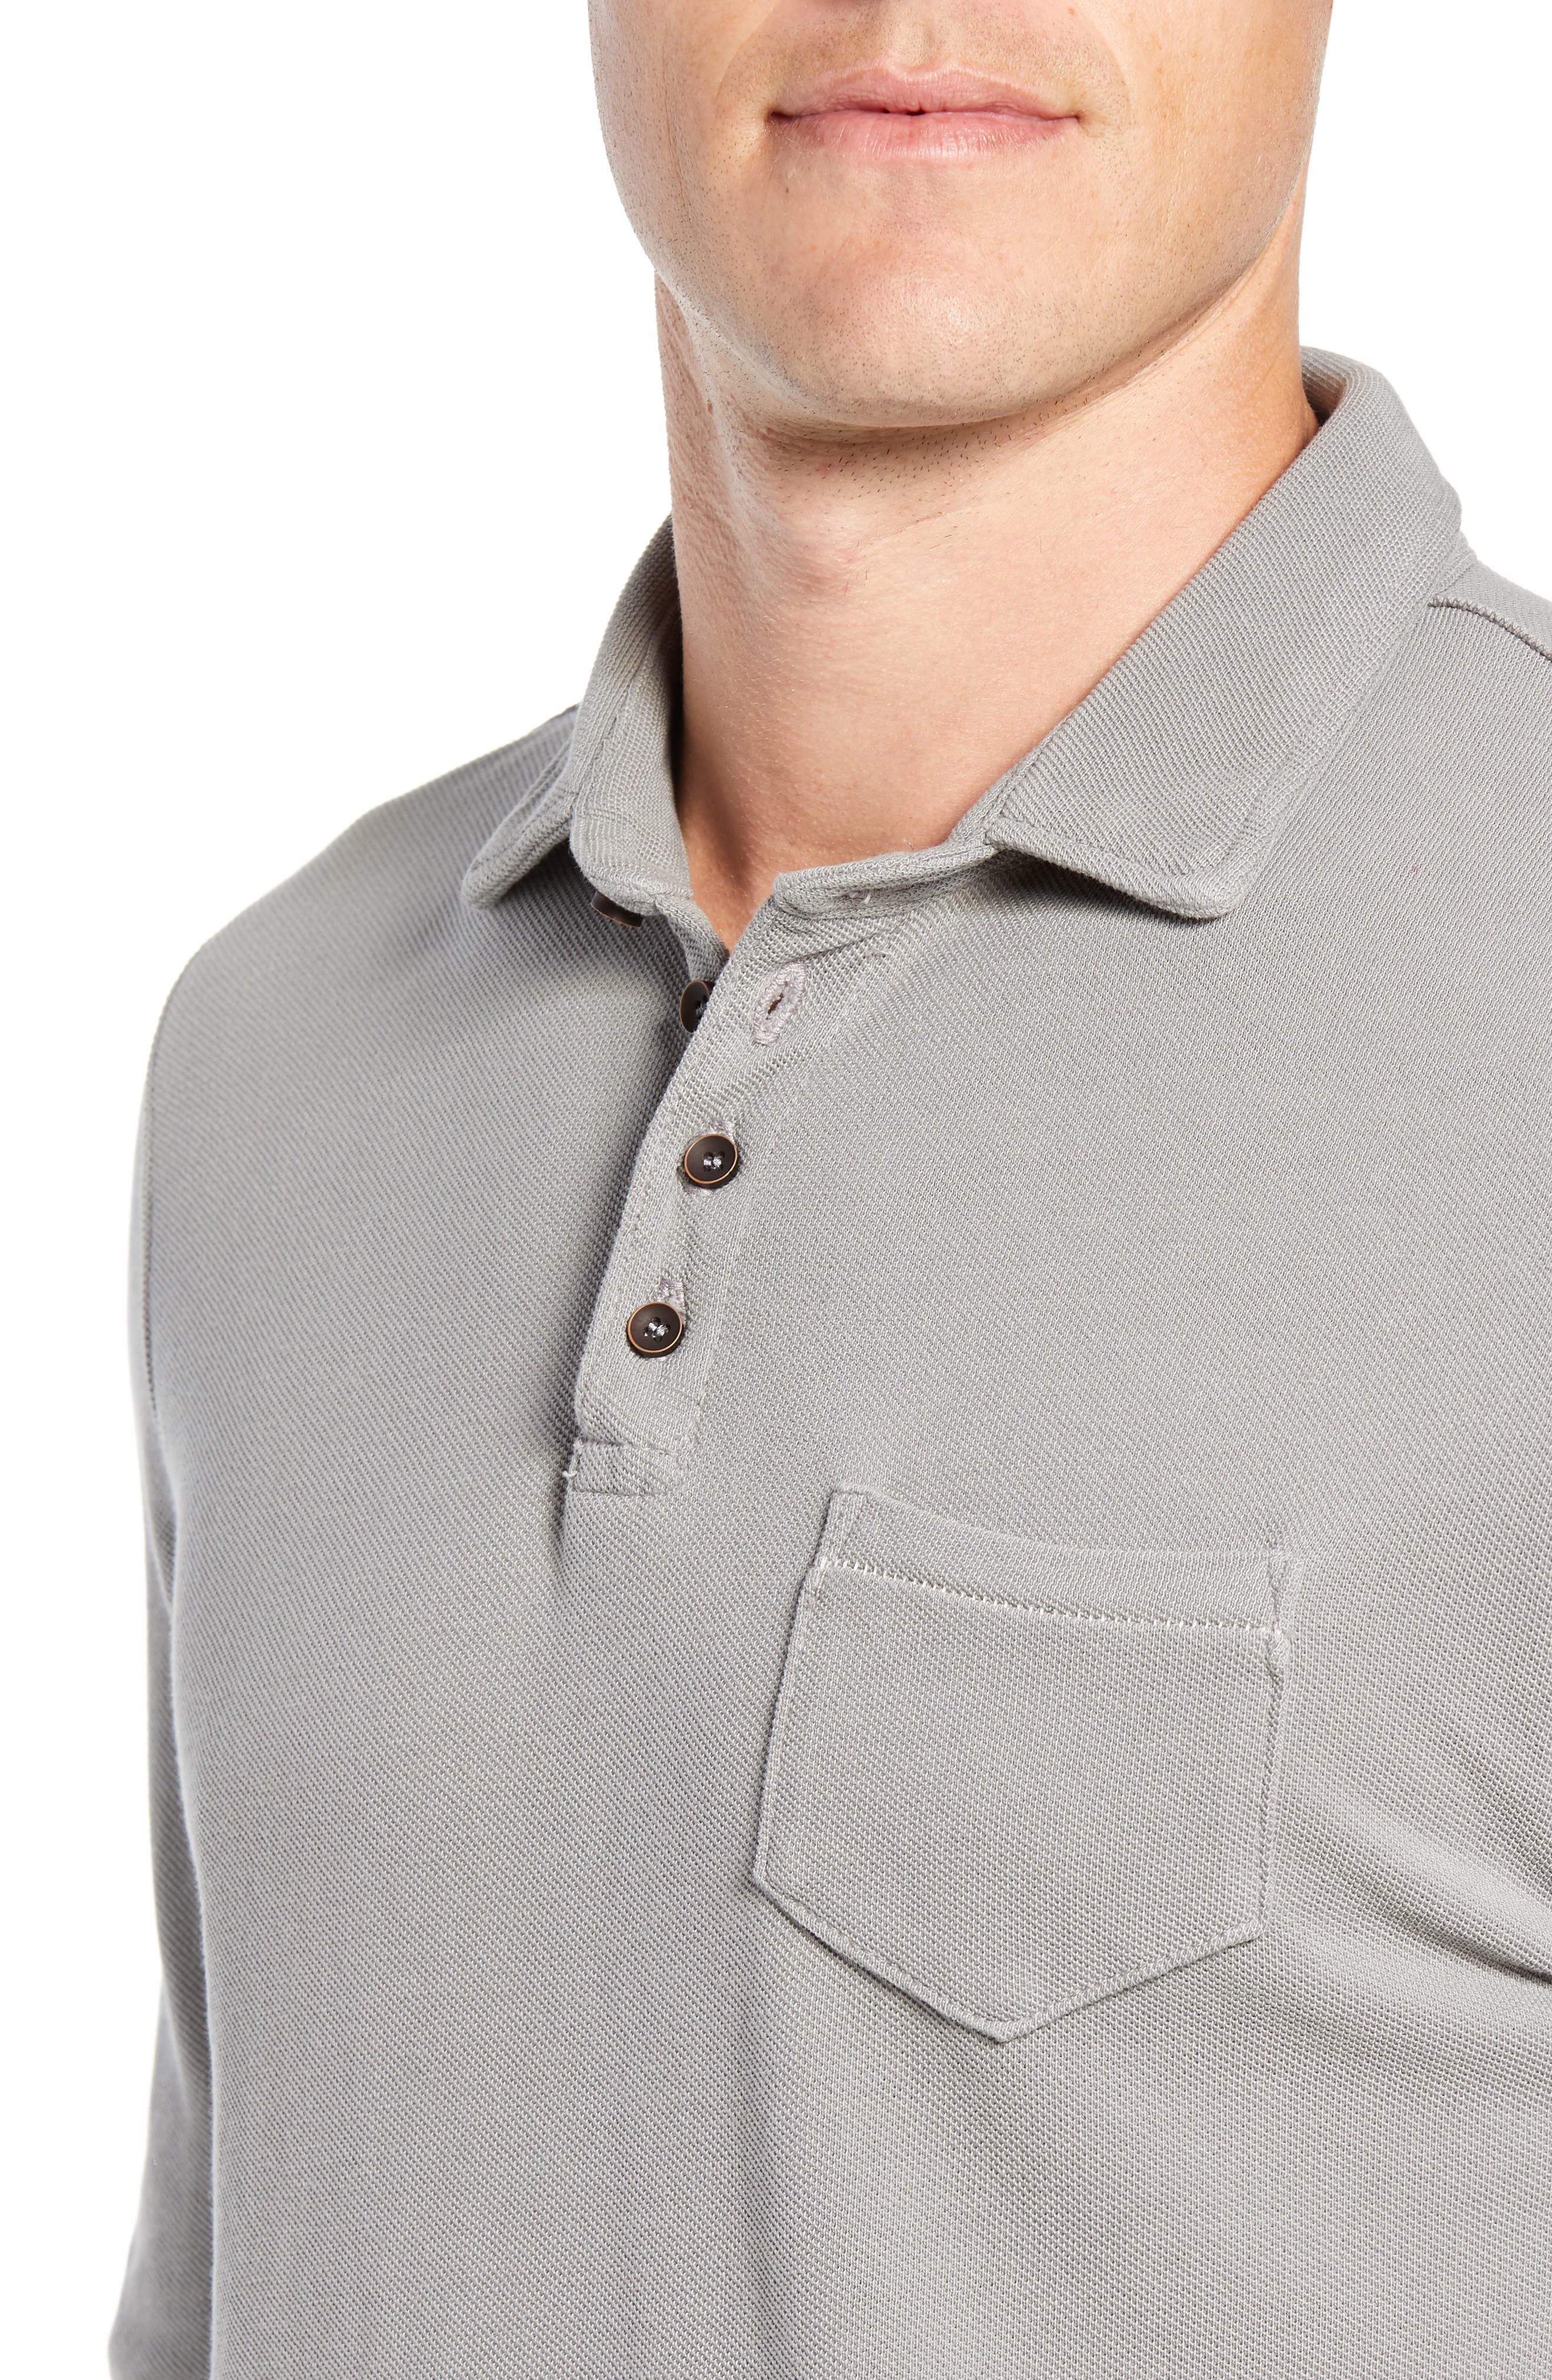 Regular Fit Long Sleeve Piqué Polo,                             Alternate thumbnail 4, color,                             GREY